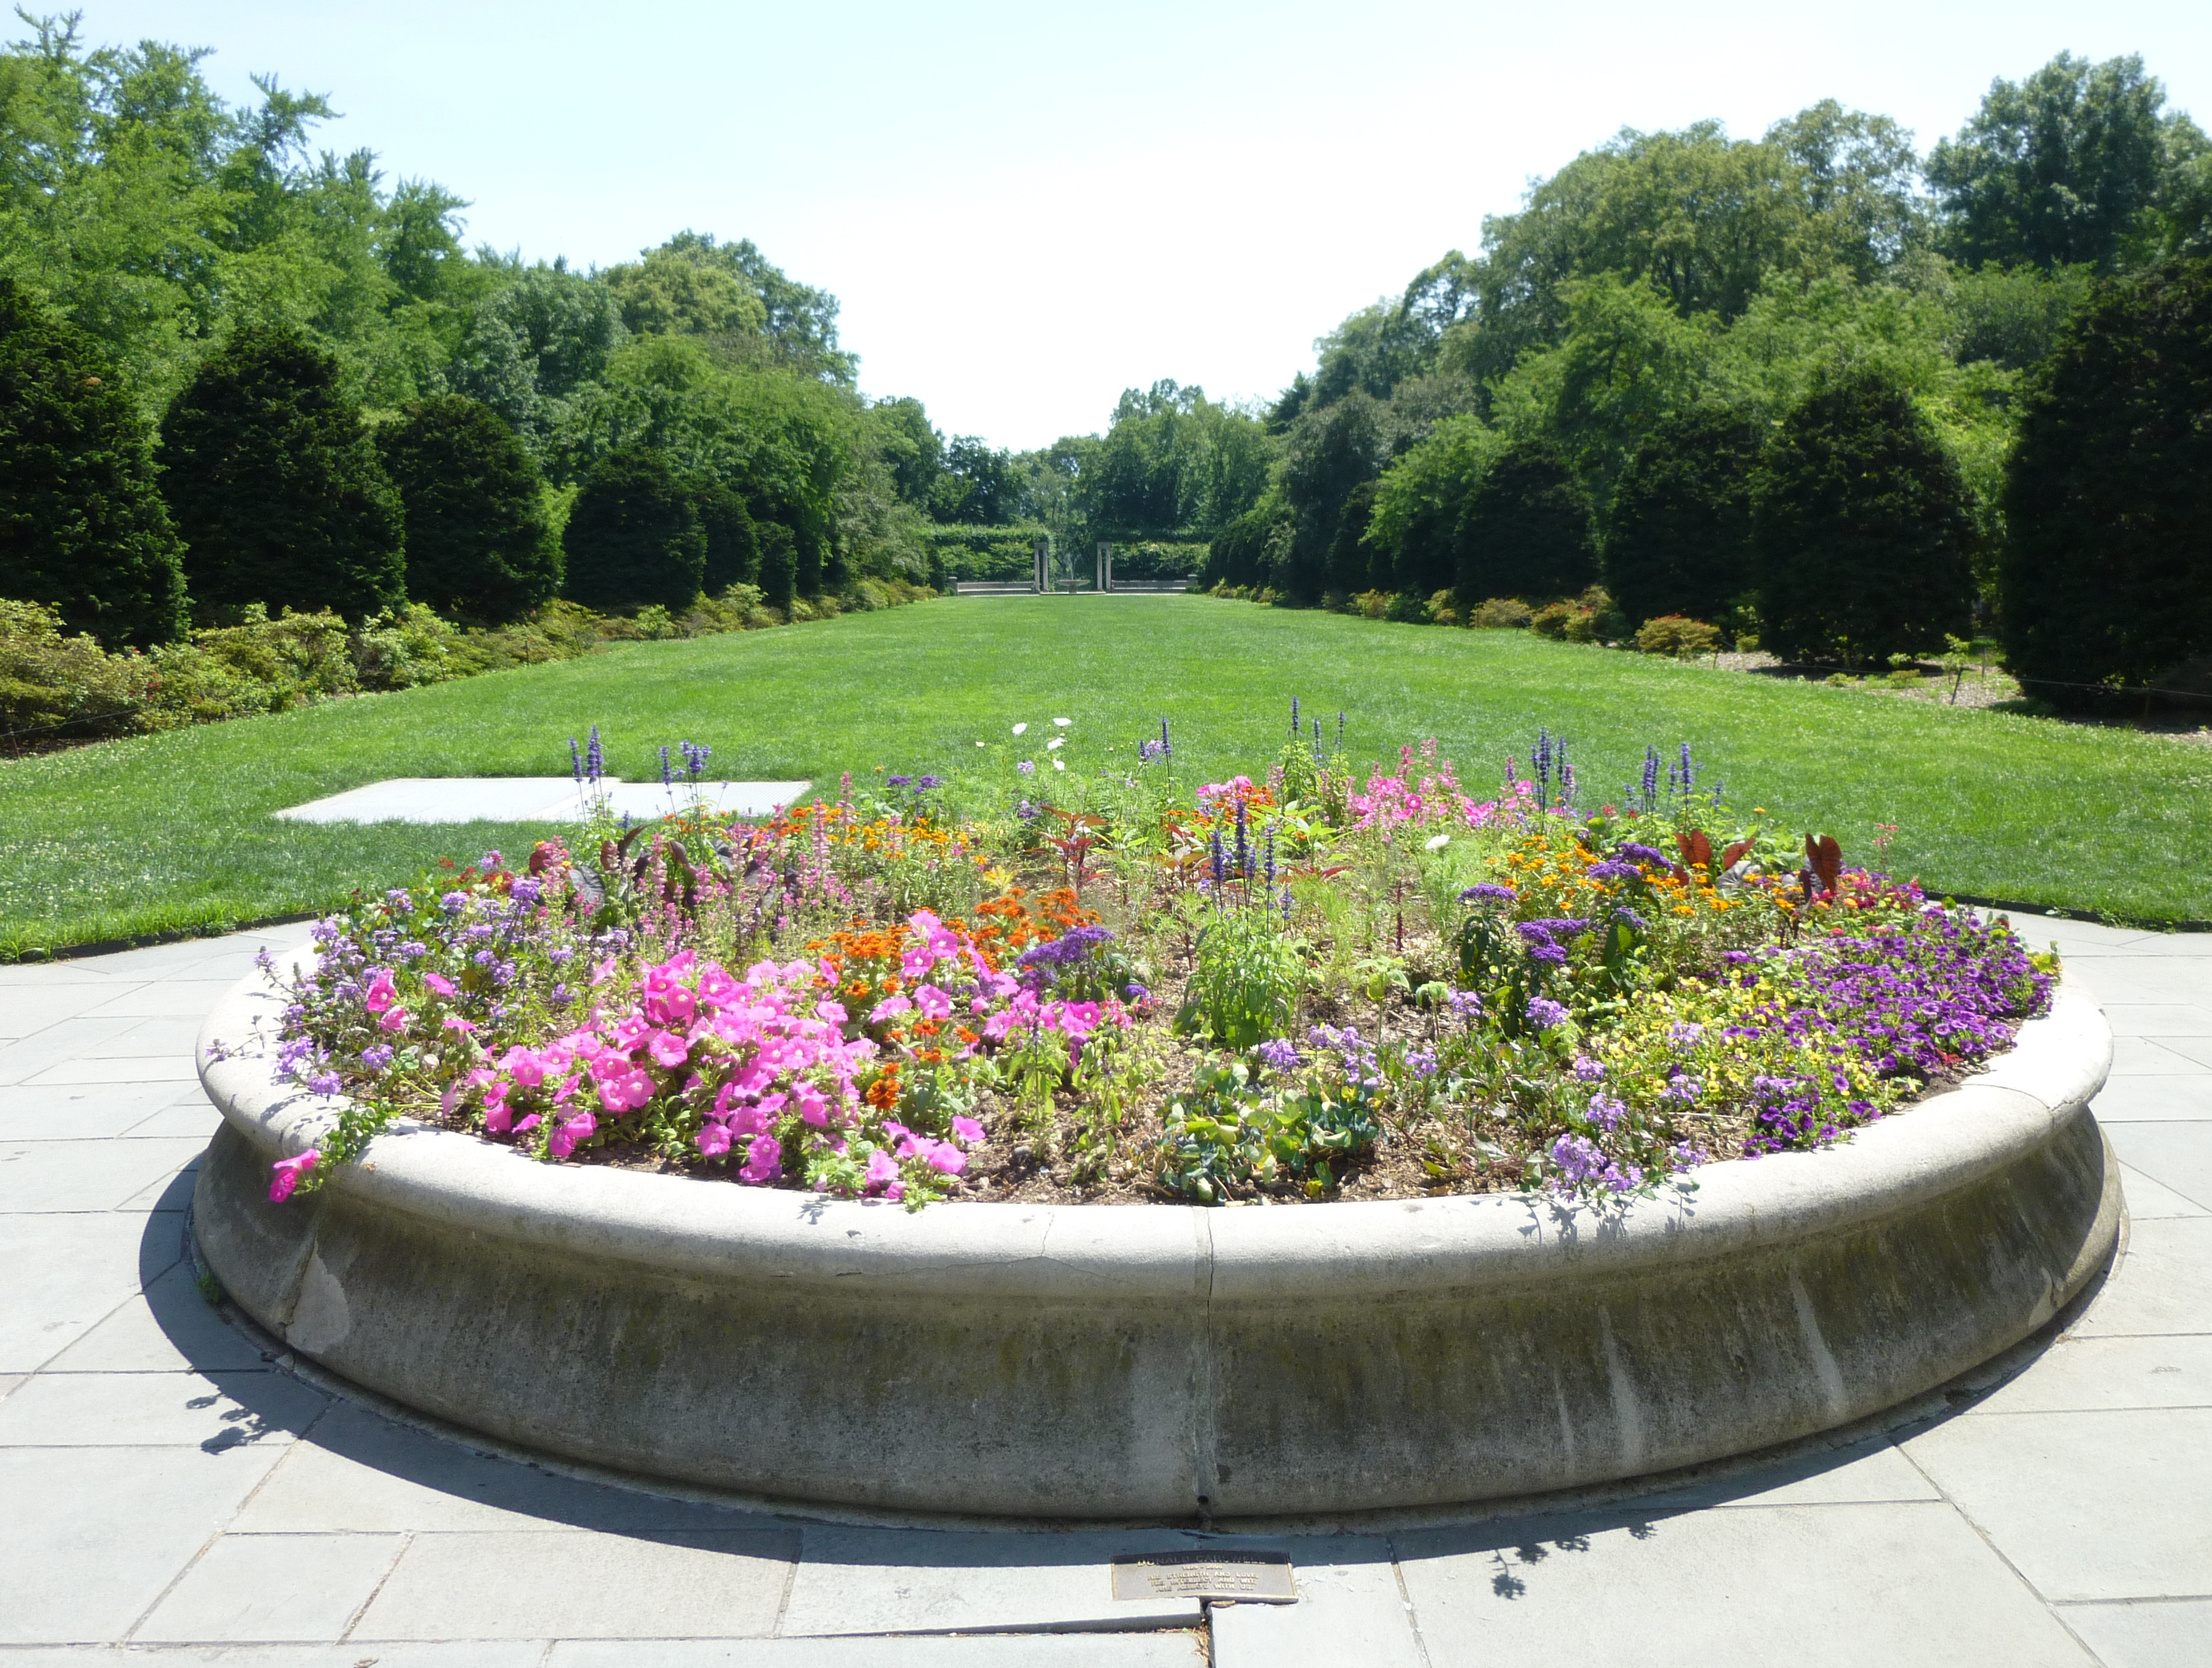 Brooklyn botanical garden flatbush entrance garden ftempo - Brooklyn botanical garden admission ...